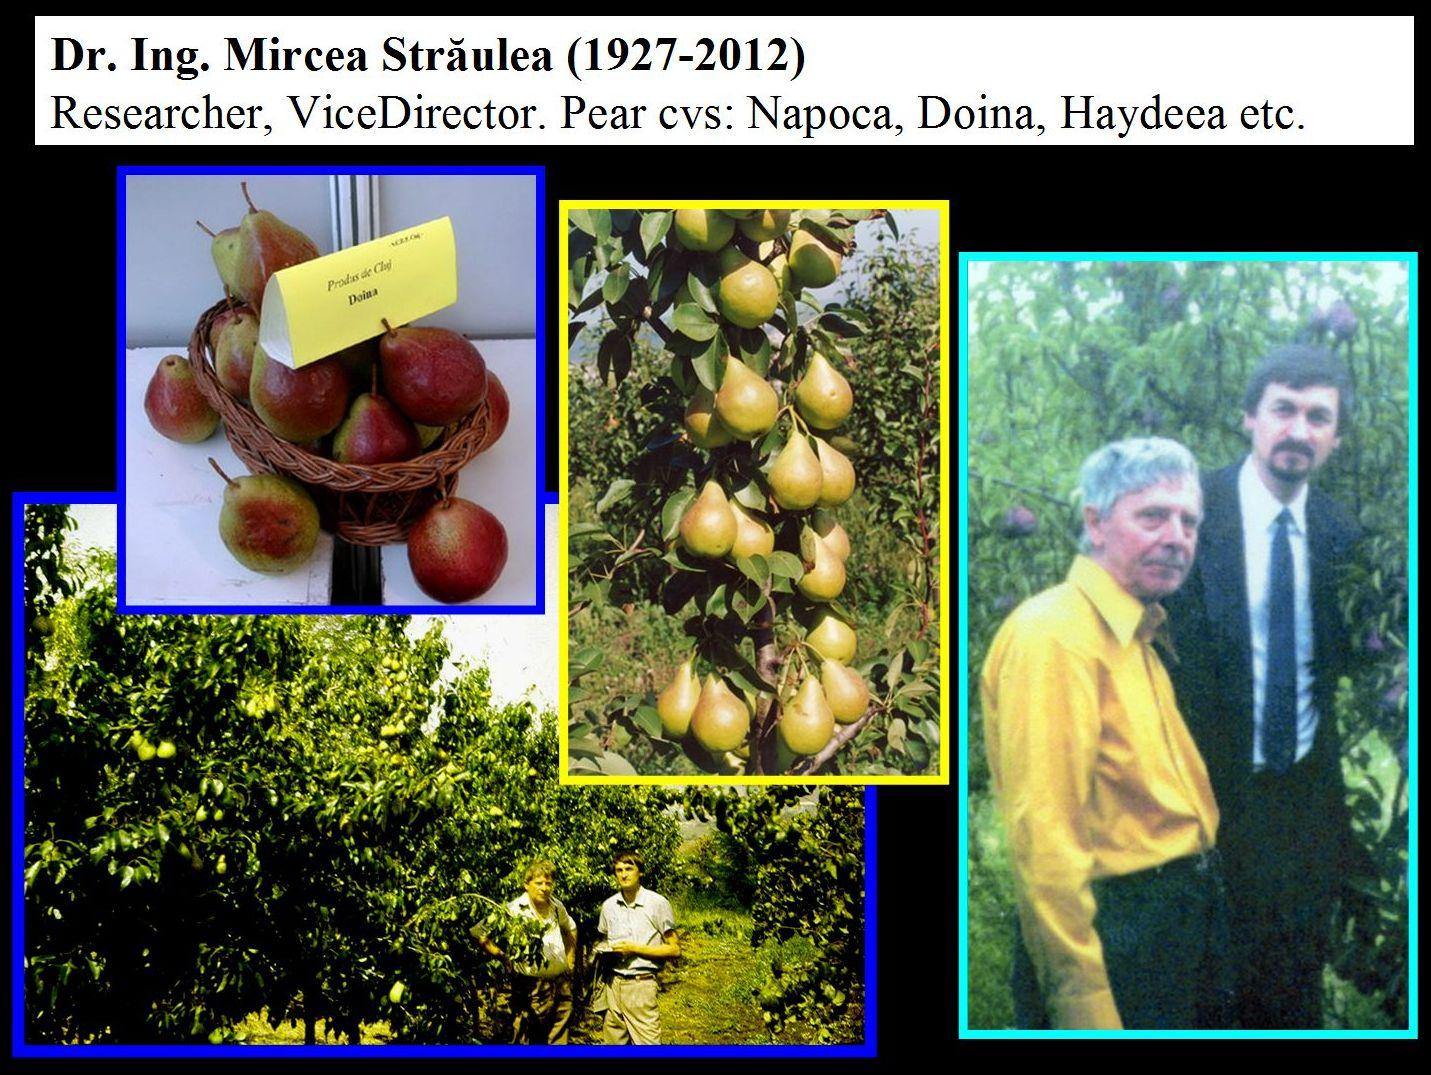 Dr Mircea Straulea and Prof. dr. Radu E. Sestras. Pear cultivars